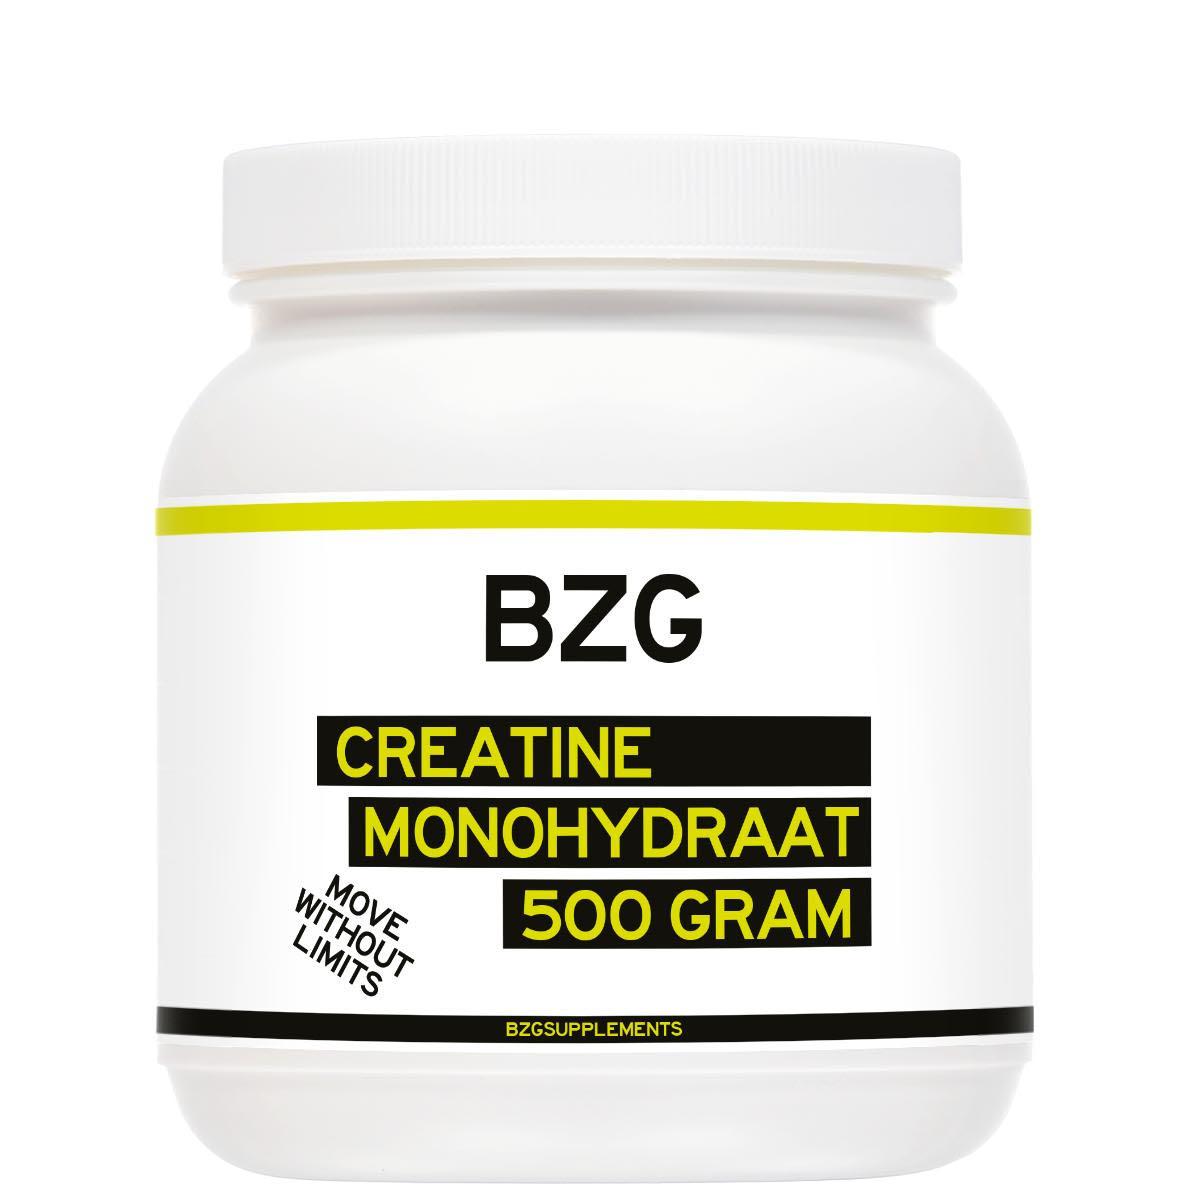 BZG Creatine Monohydraat